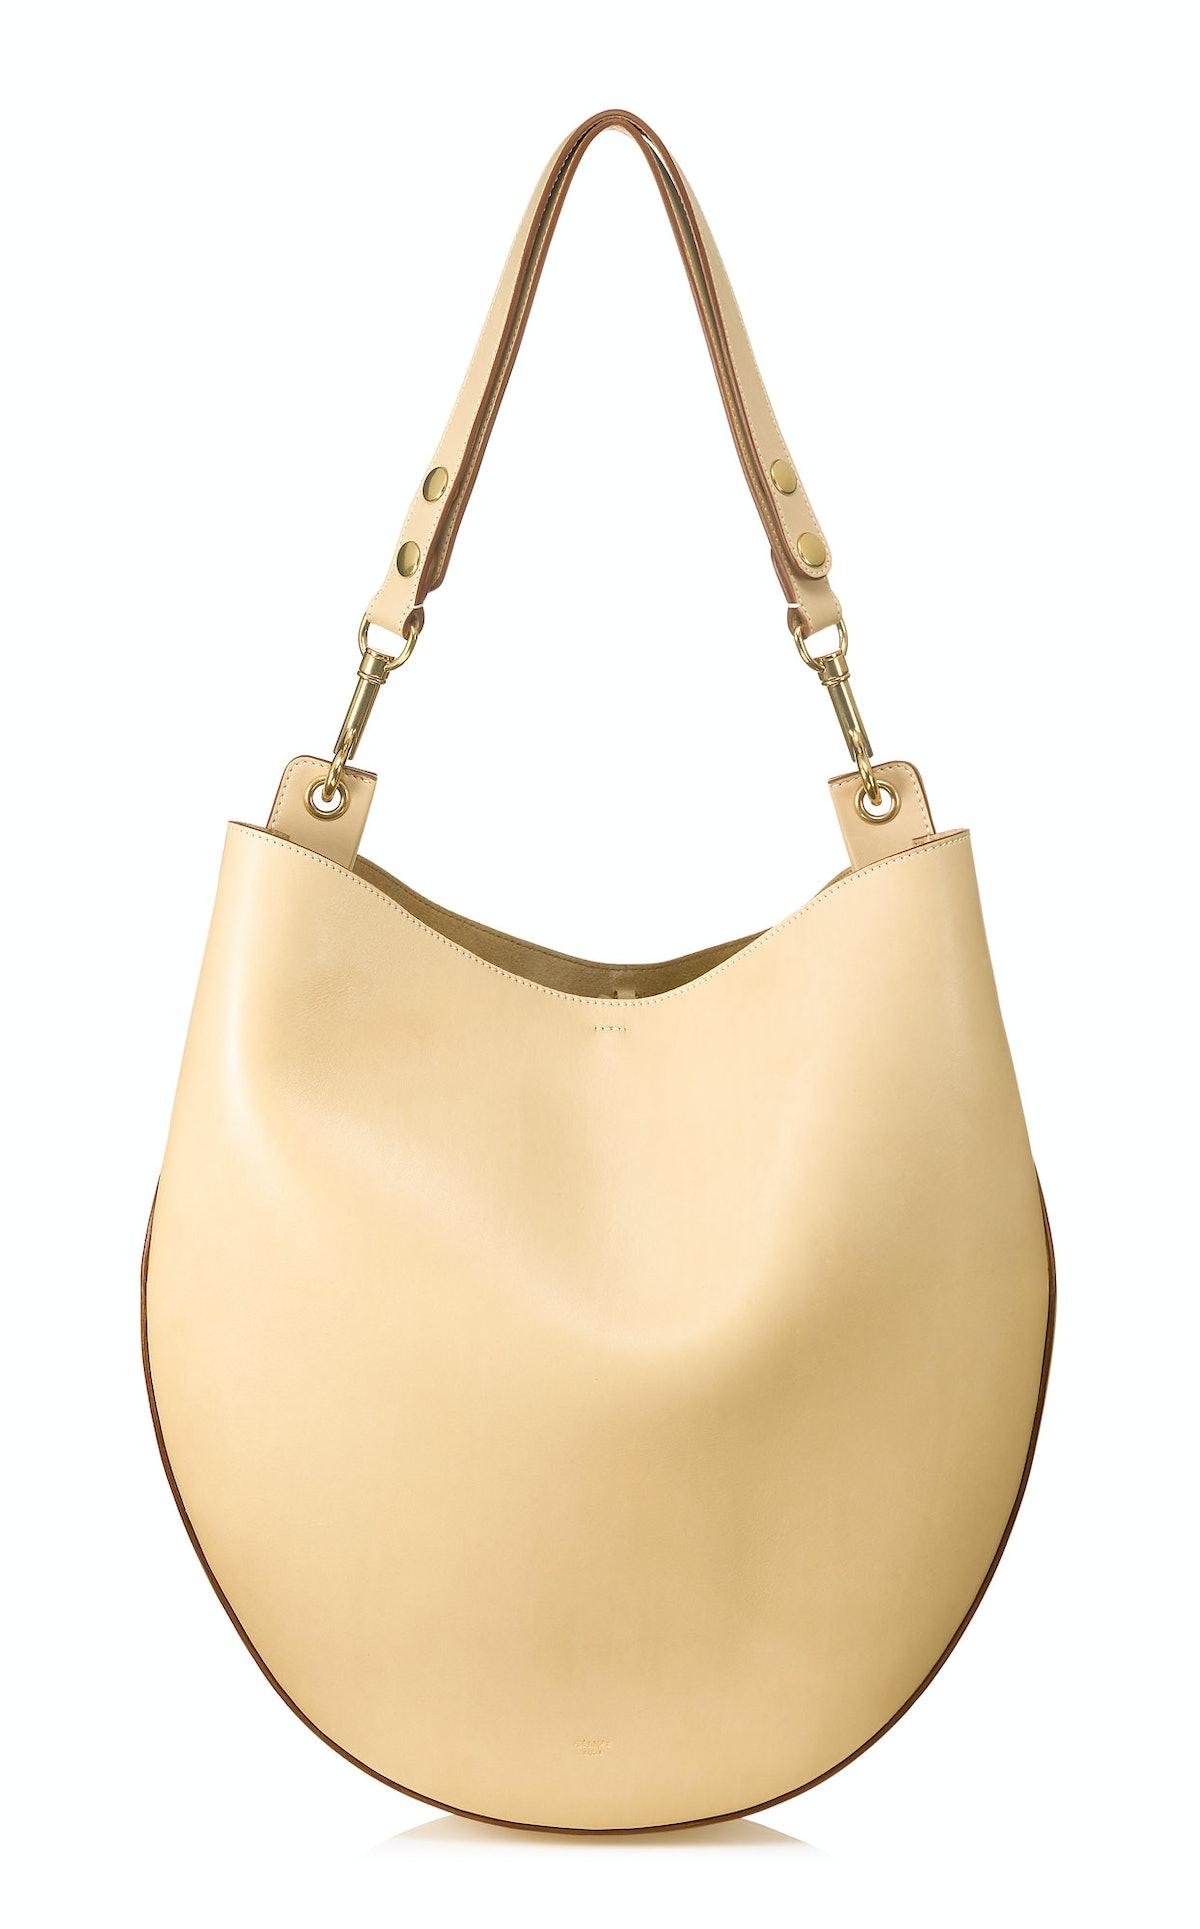 Céline bag, $2,950, By George, Austin, TX, 877.472.5951.